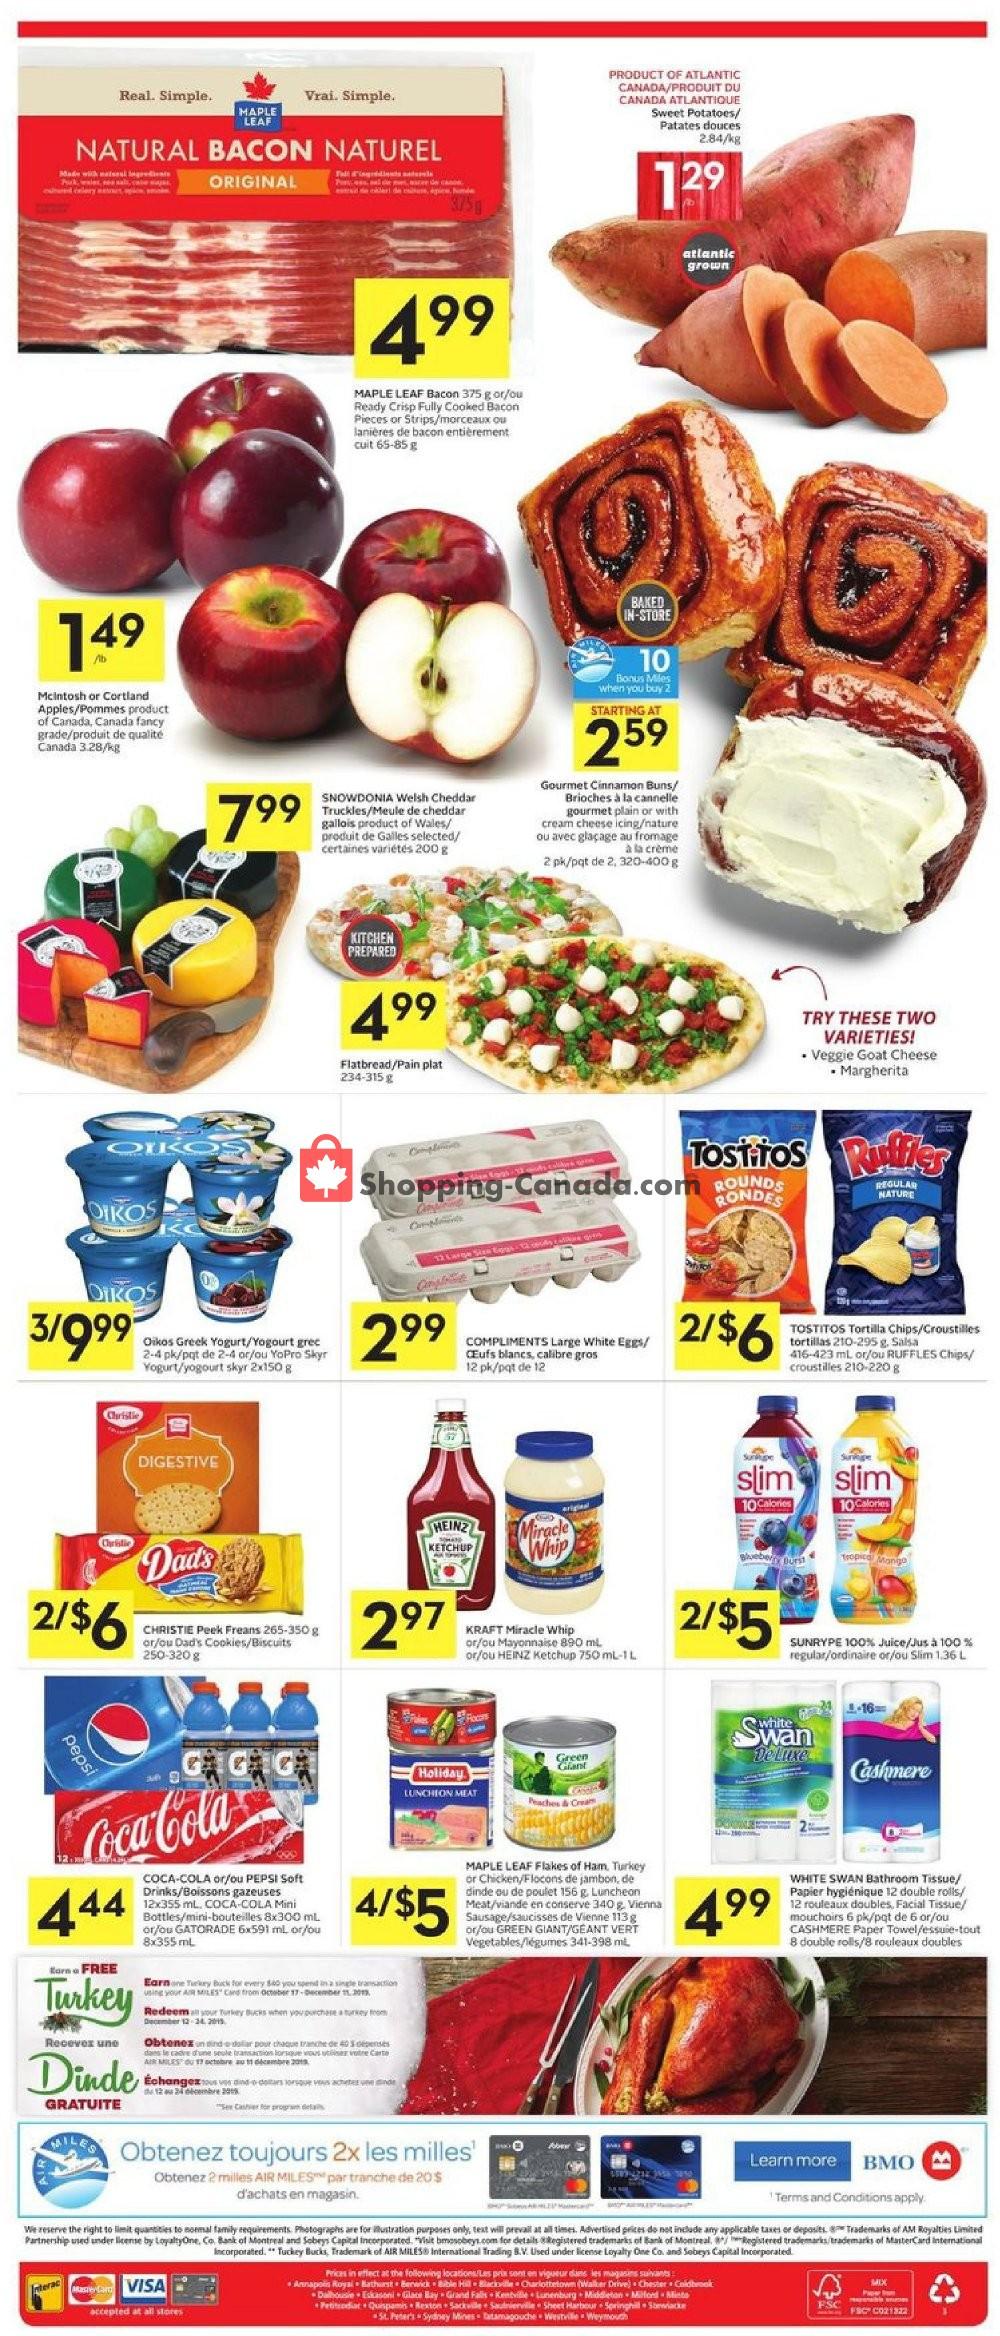 Flyer Foodland Canada - from Thursday November 7, 2019 to Wednesday November 13, 2019